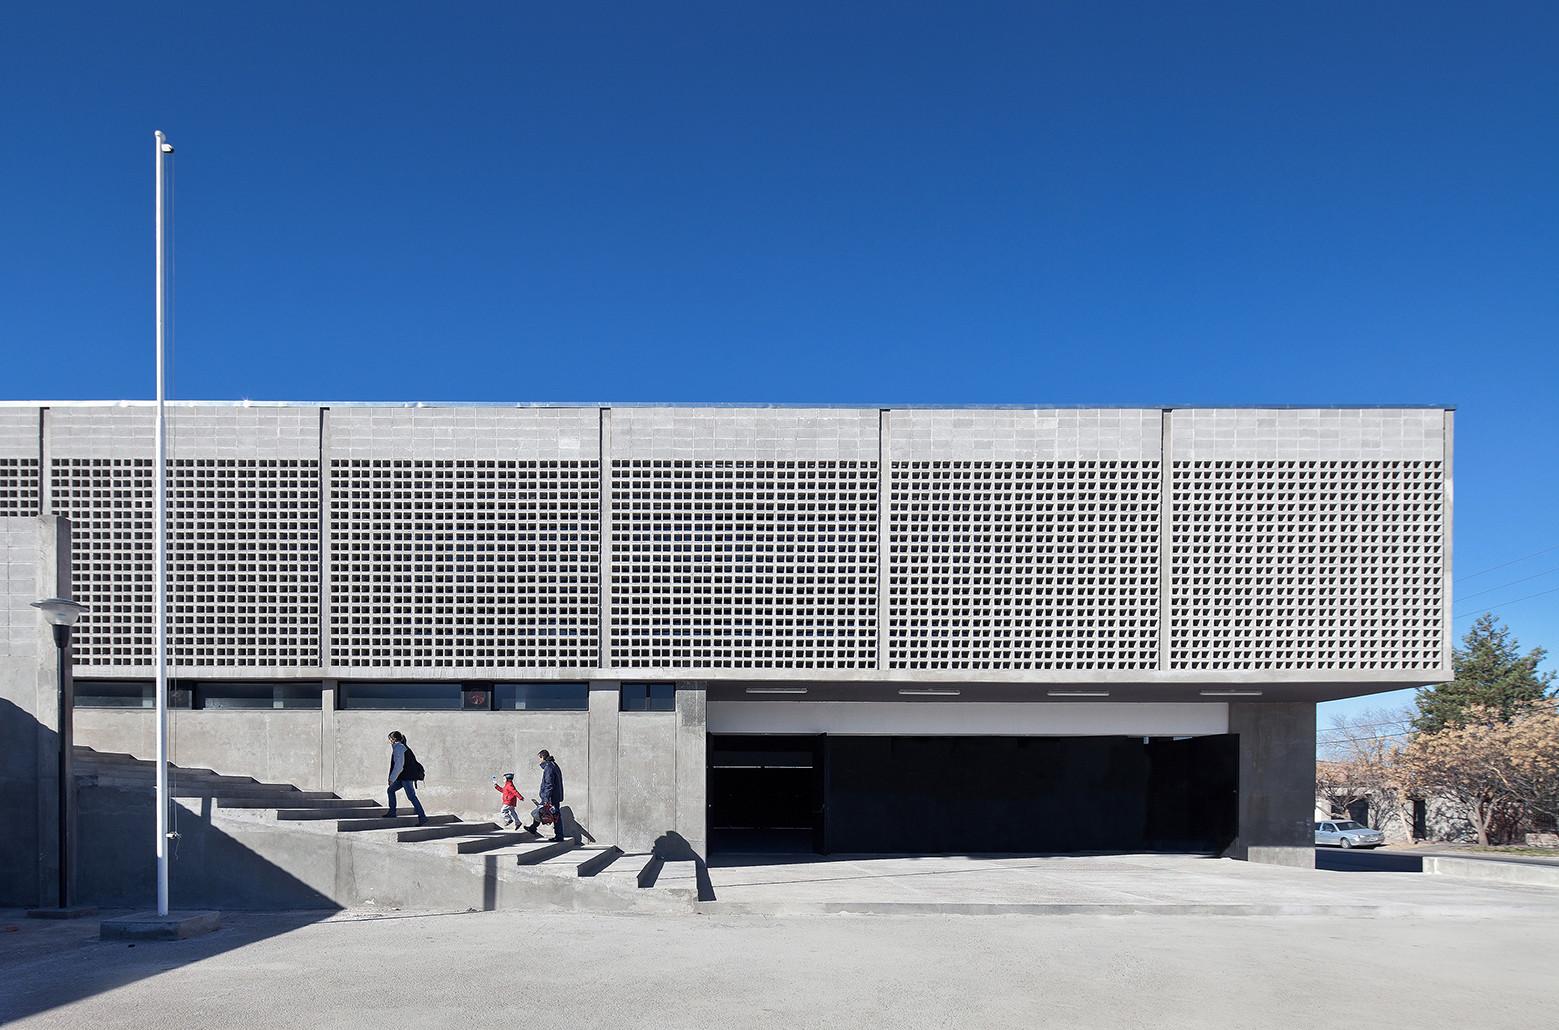 Poliesportivo Bº Províncias Unidas / Estudio demarchisalcedo.arqs + Barigelli & Asoc, © Maju Franzán